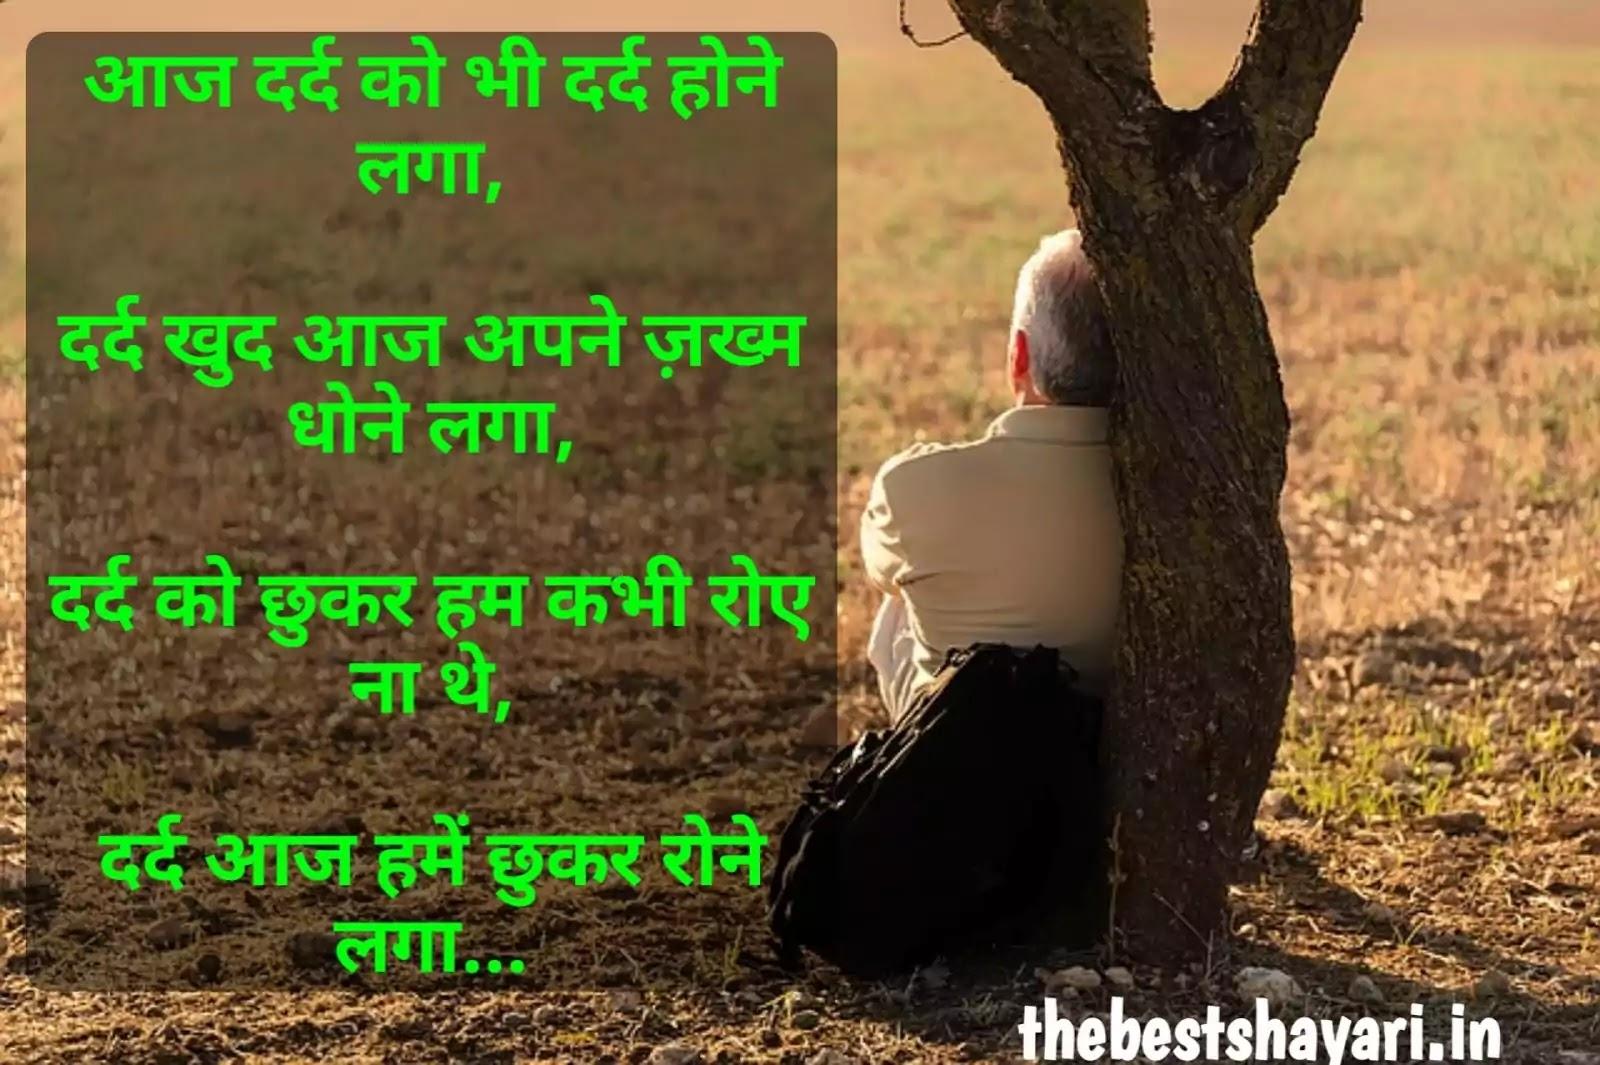 Dard bhari shayari Hindi me